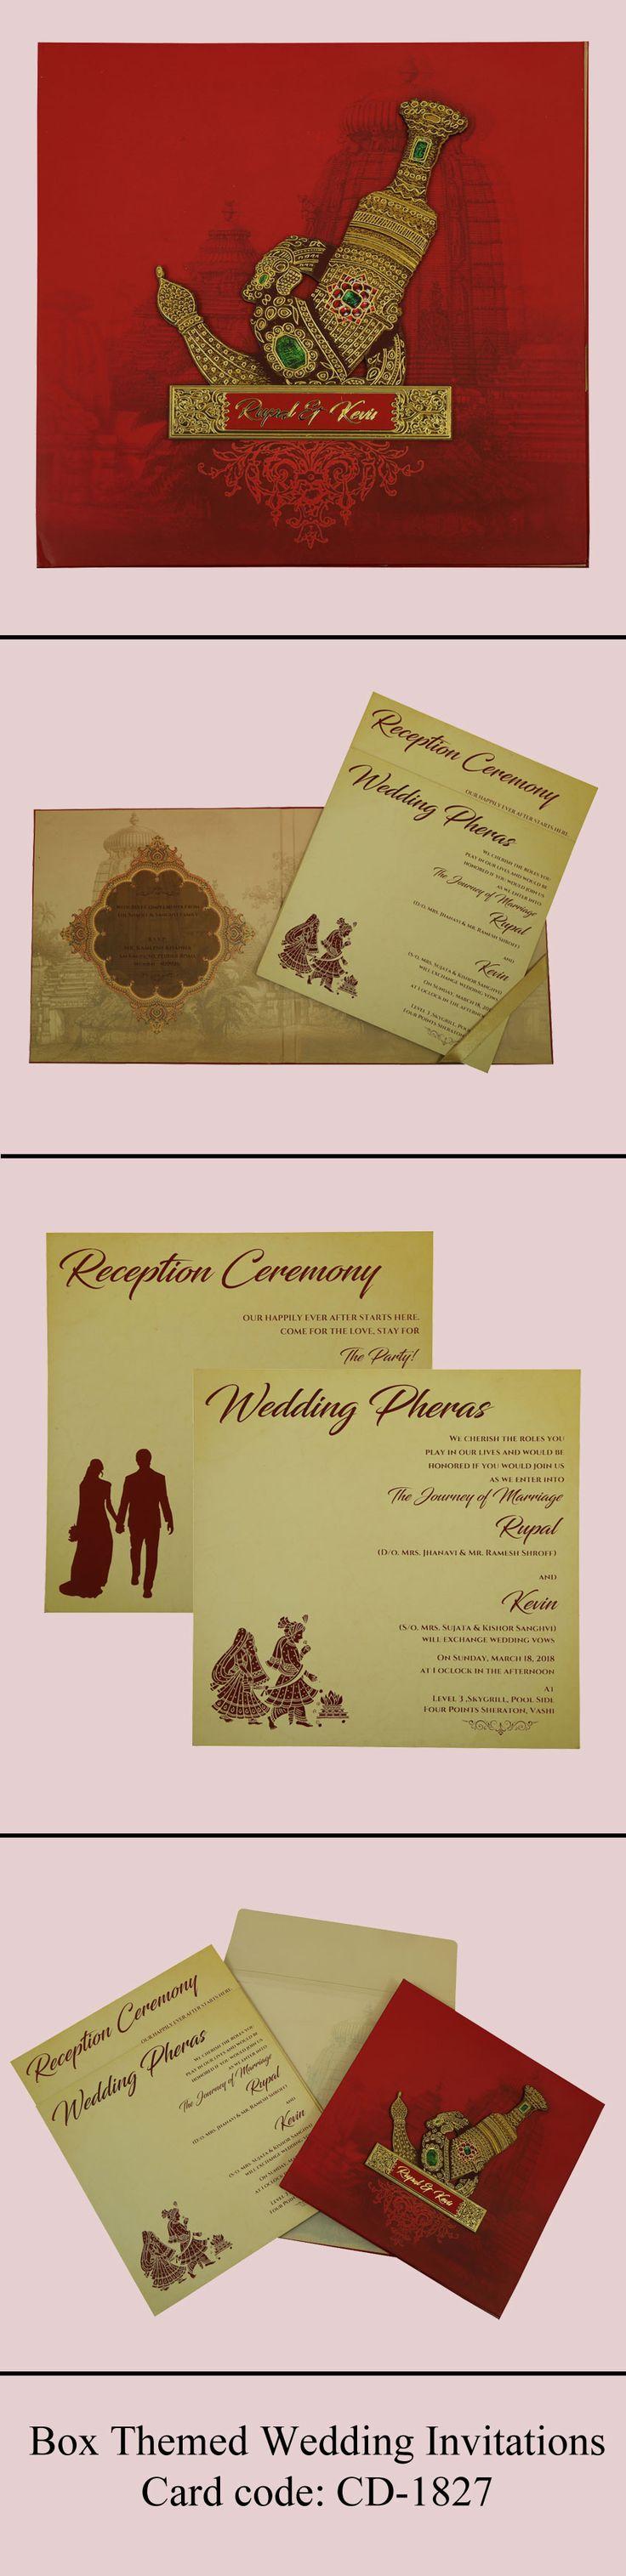 BOX THEMED WEDDING INVITATIONS....#weddings #royal #bohemian #invitation #marriage #classic #love #trends #hindu